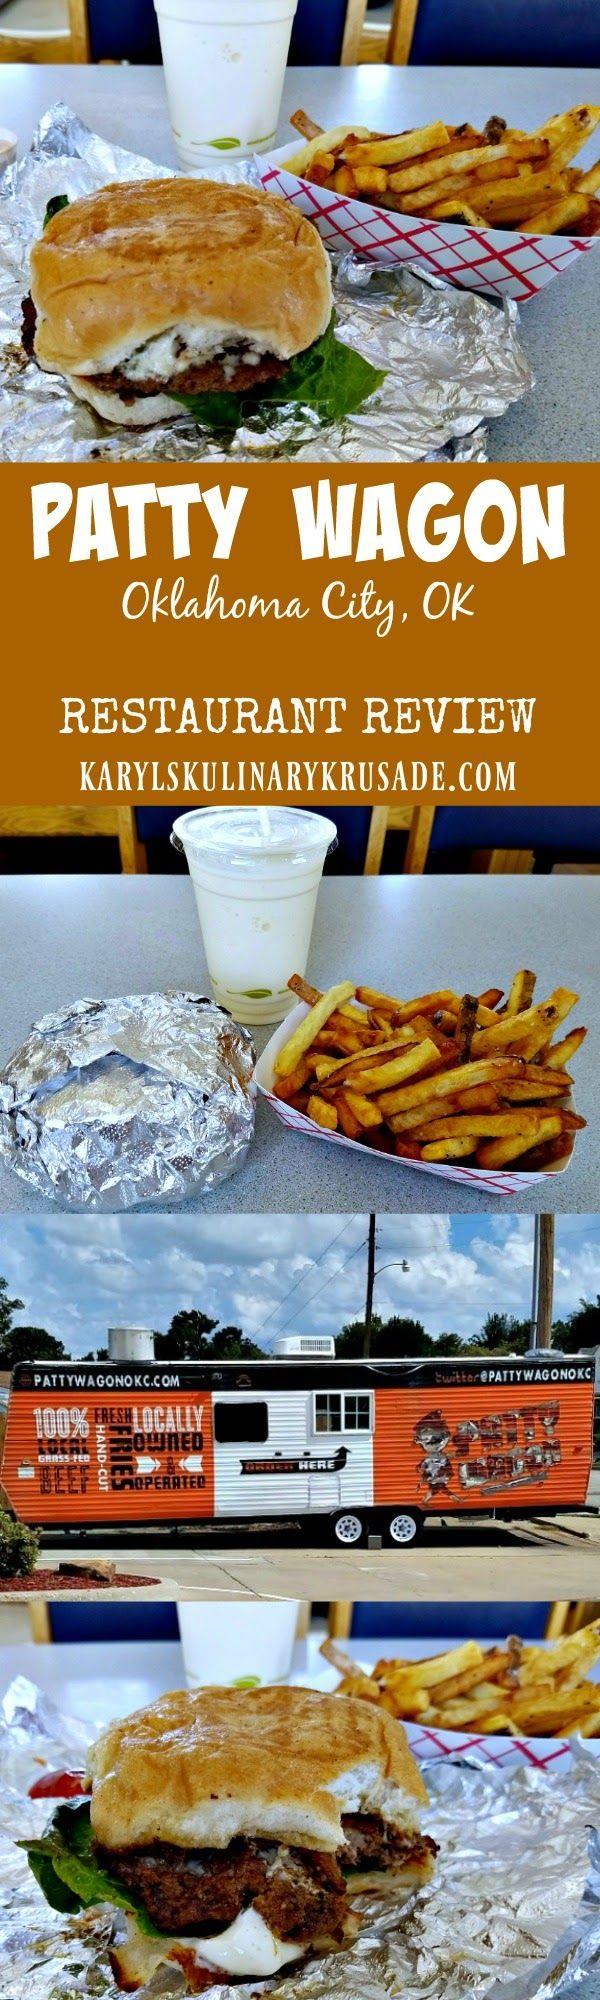 Patty Wagon Restaurant Review by Karyl's Kulinary Krusade